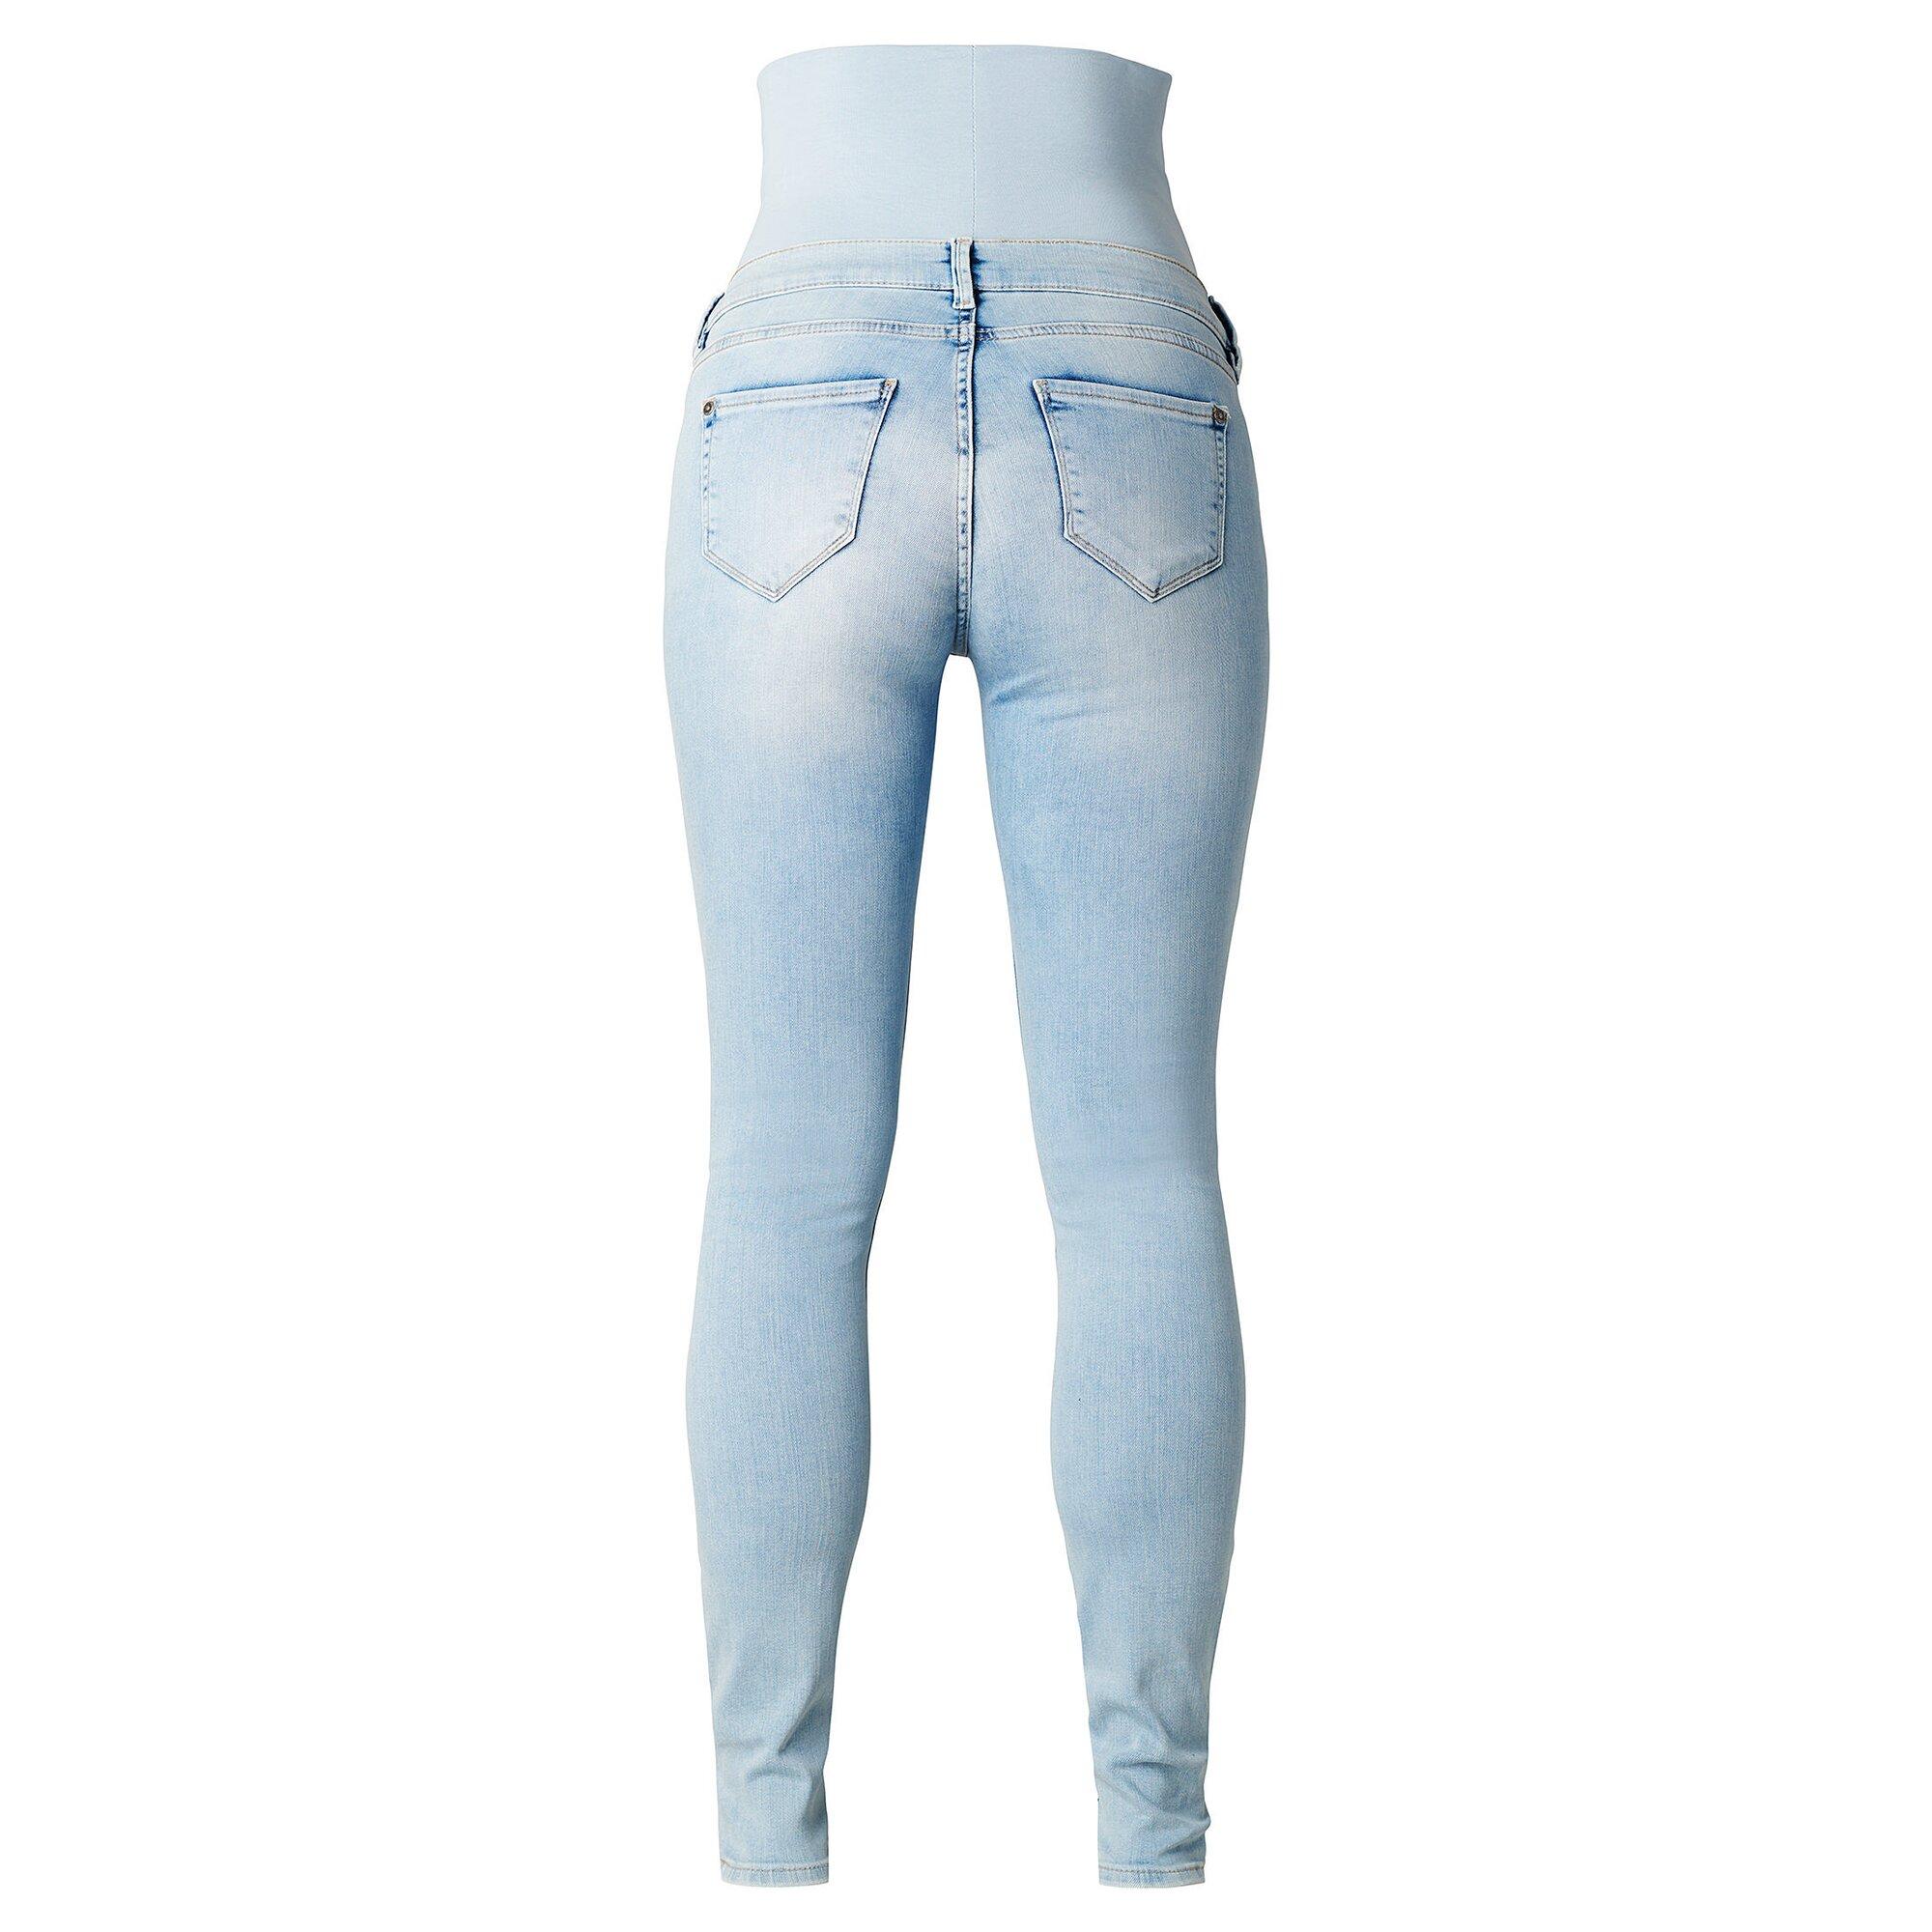 supermom-skinny-umstandsjeans-skinny, 35.99 EUR @ babywalz-de